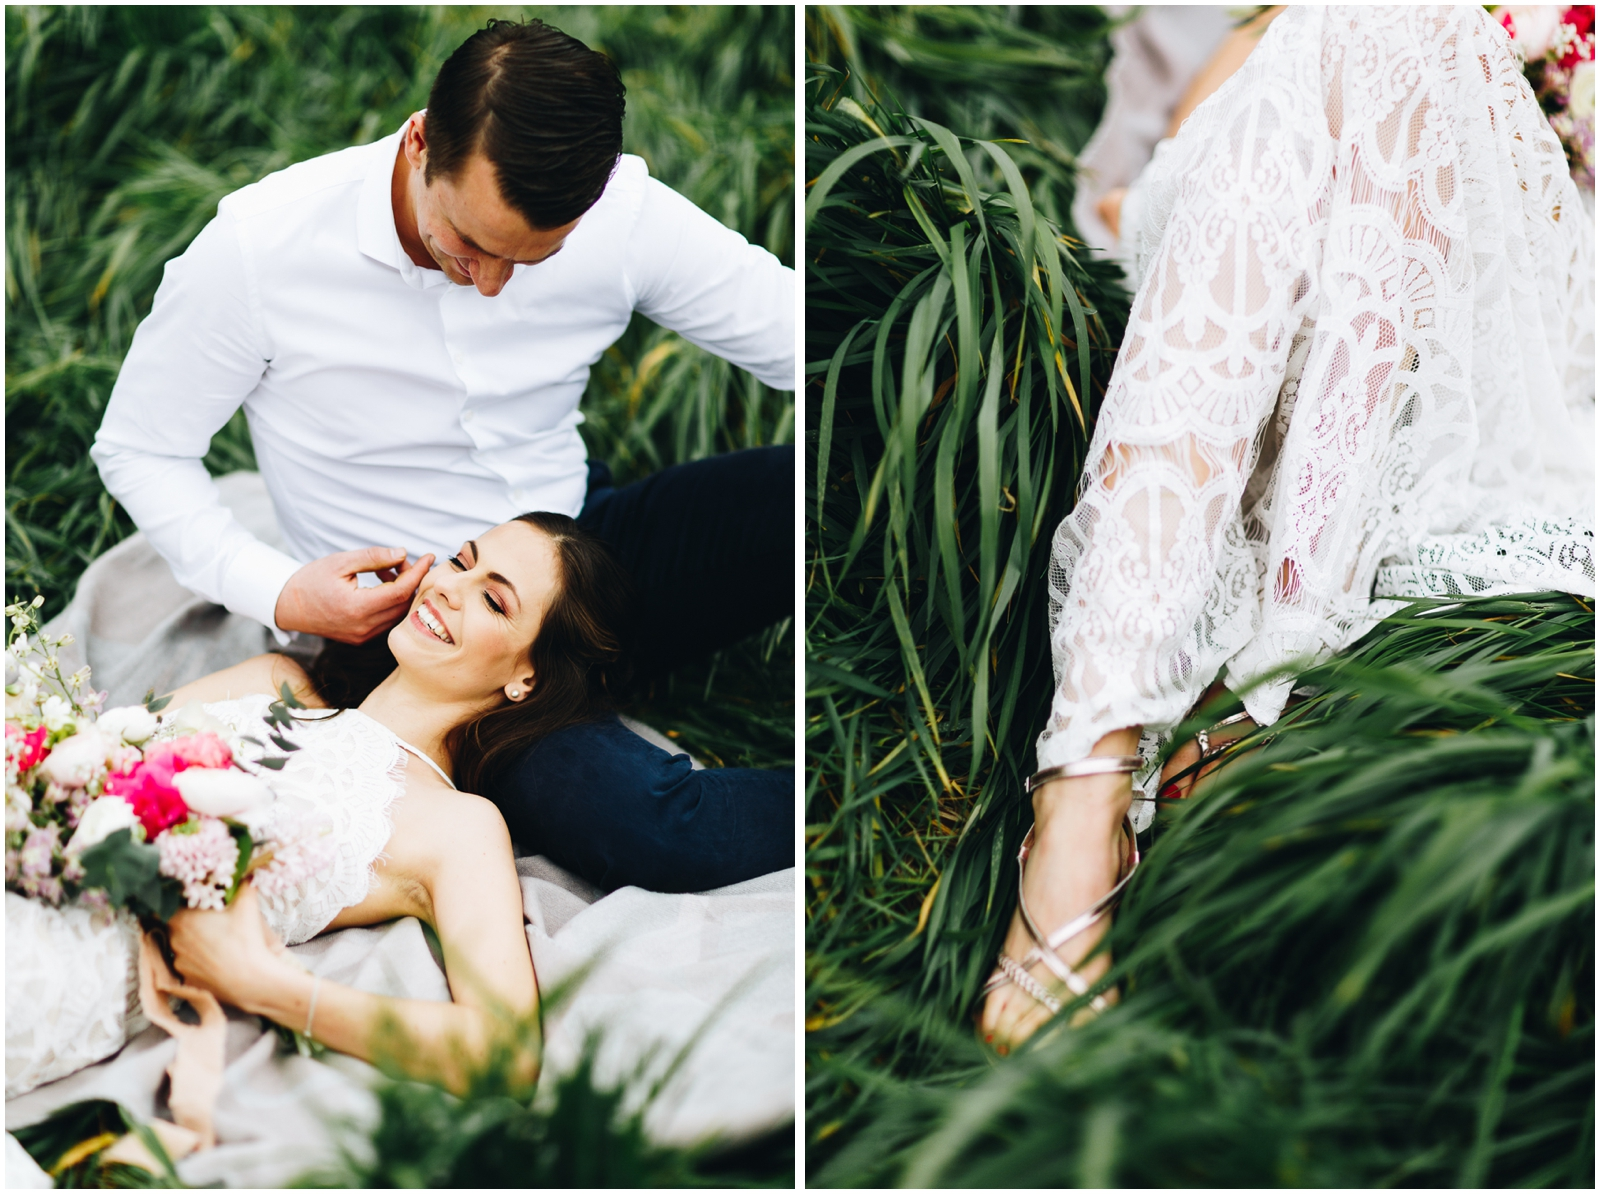 LE HAI LINH Photography-Hochzeitsfotograf-Bohohochzeit-_0012.jpg